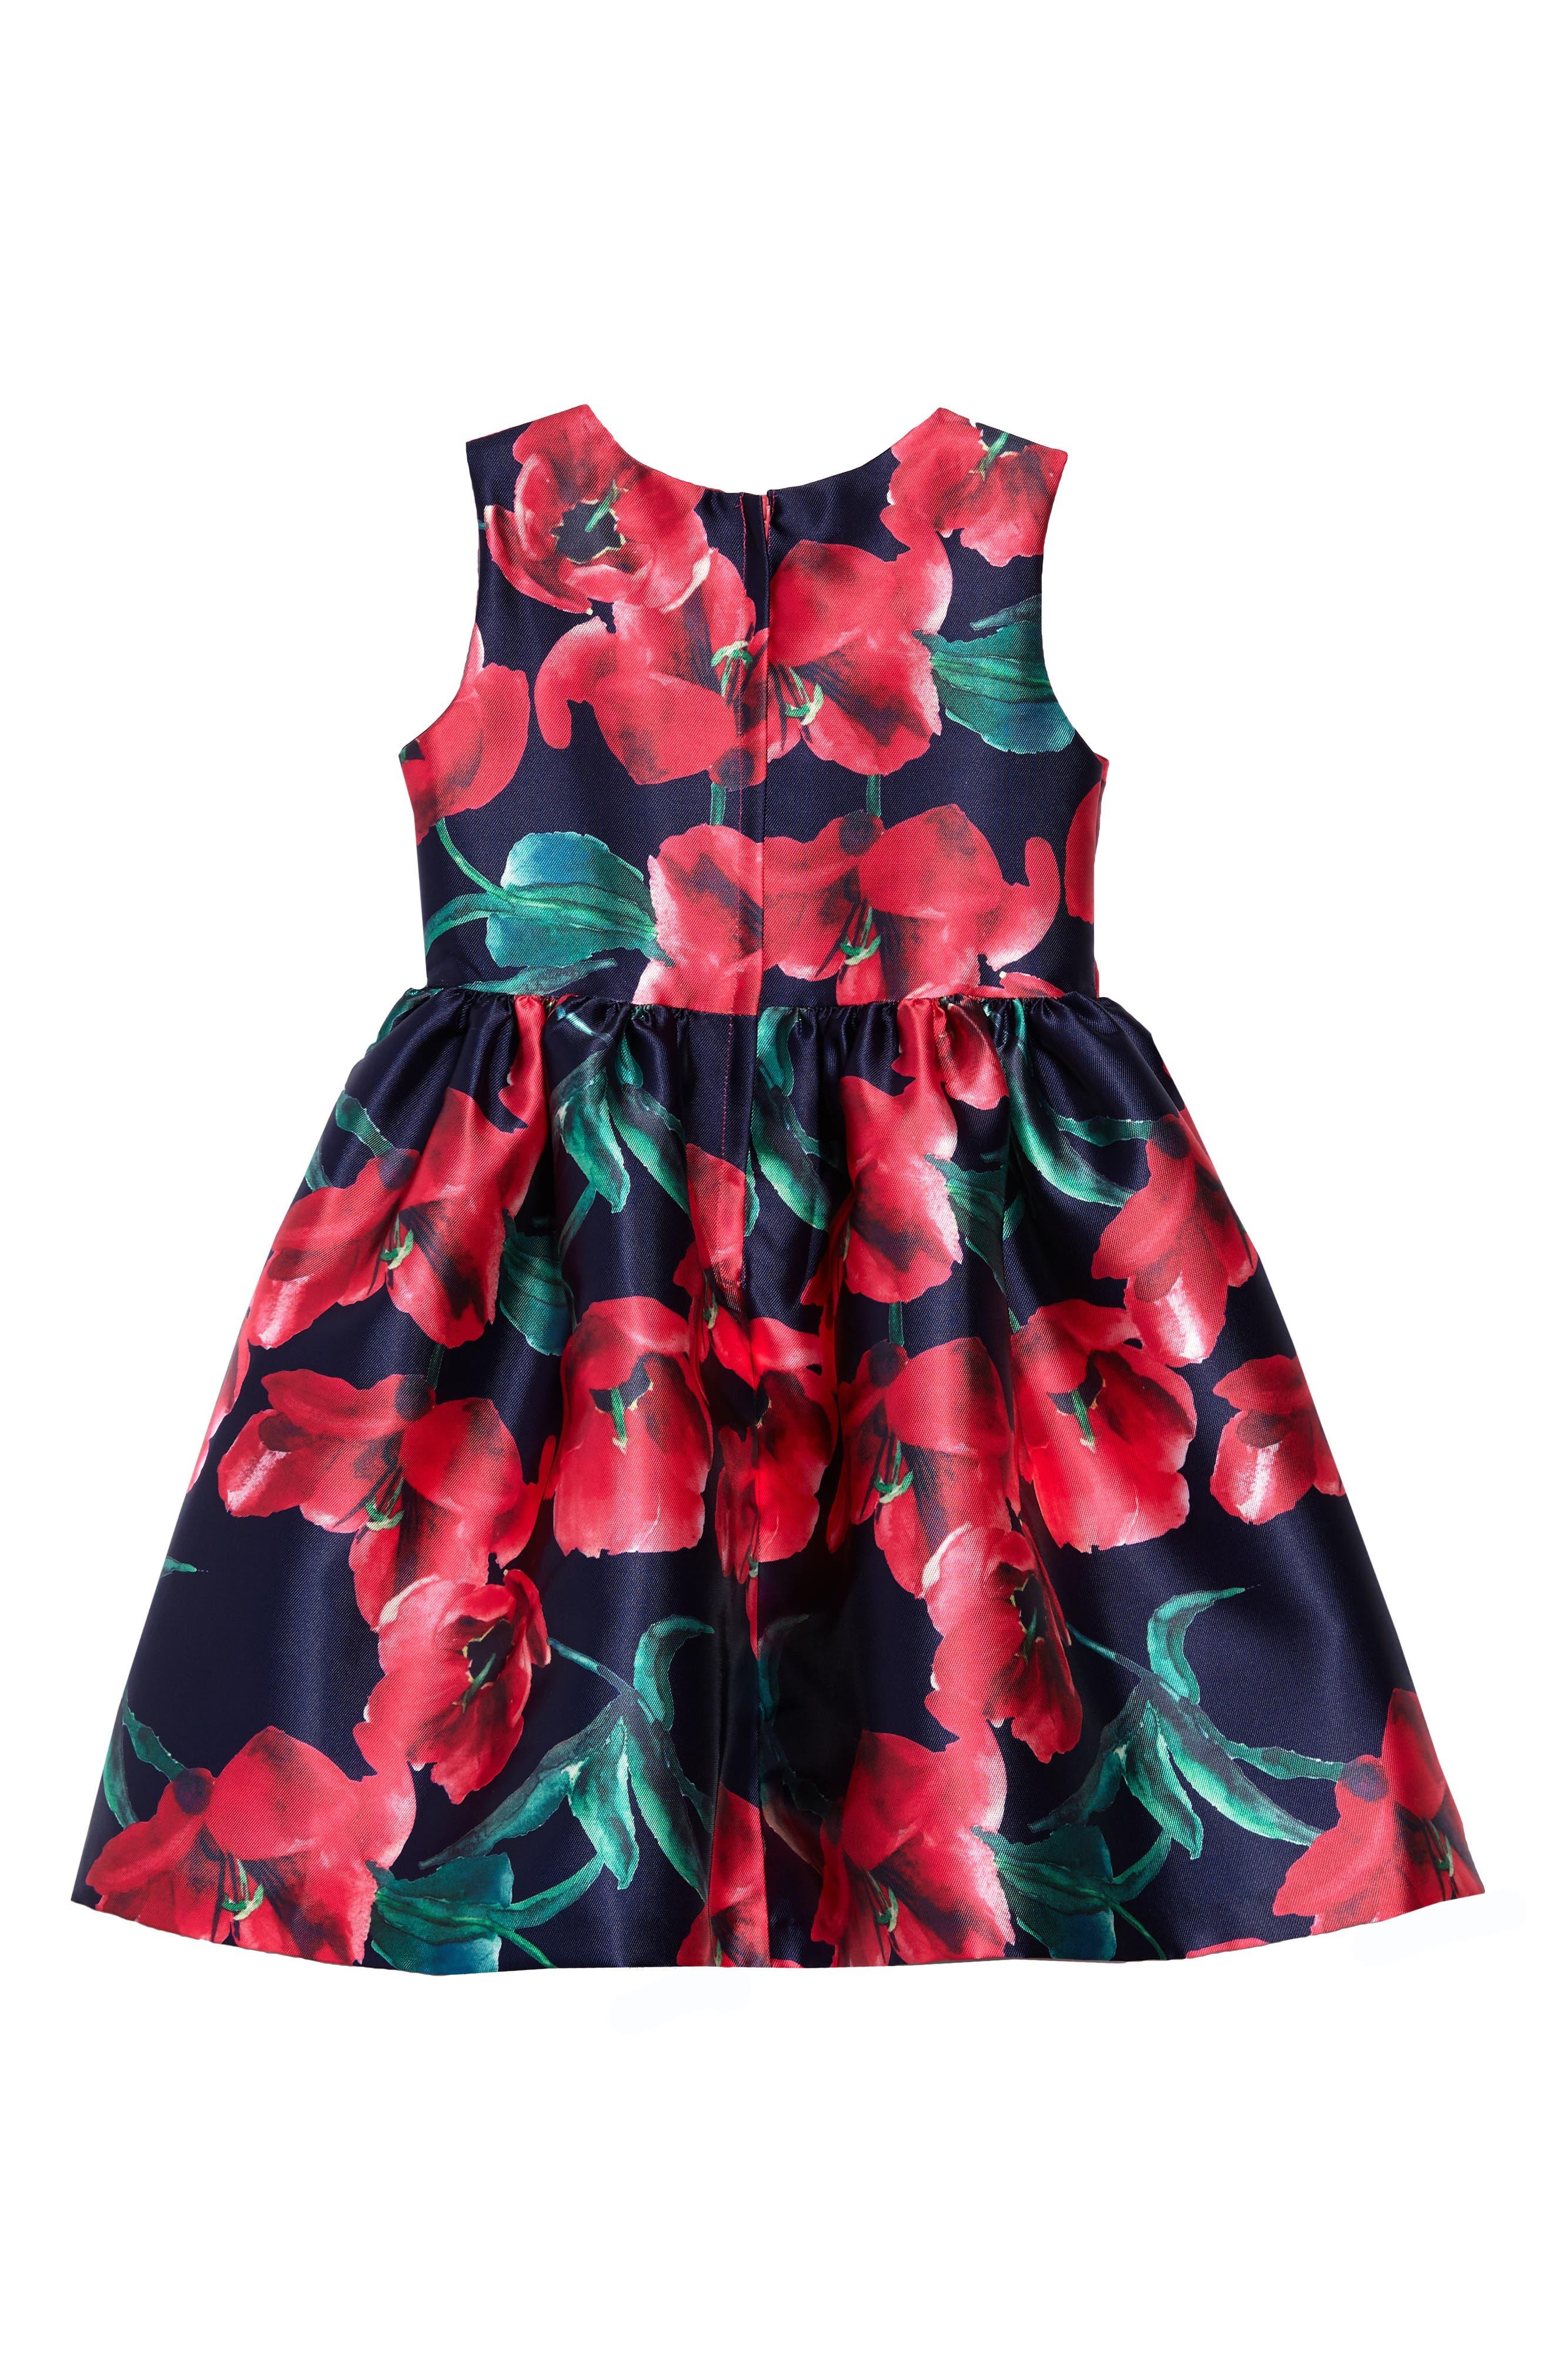 Poppy Party Dress,                             Alternate thumbnail 2, color,                             Navy/ Fuschia